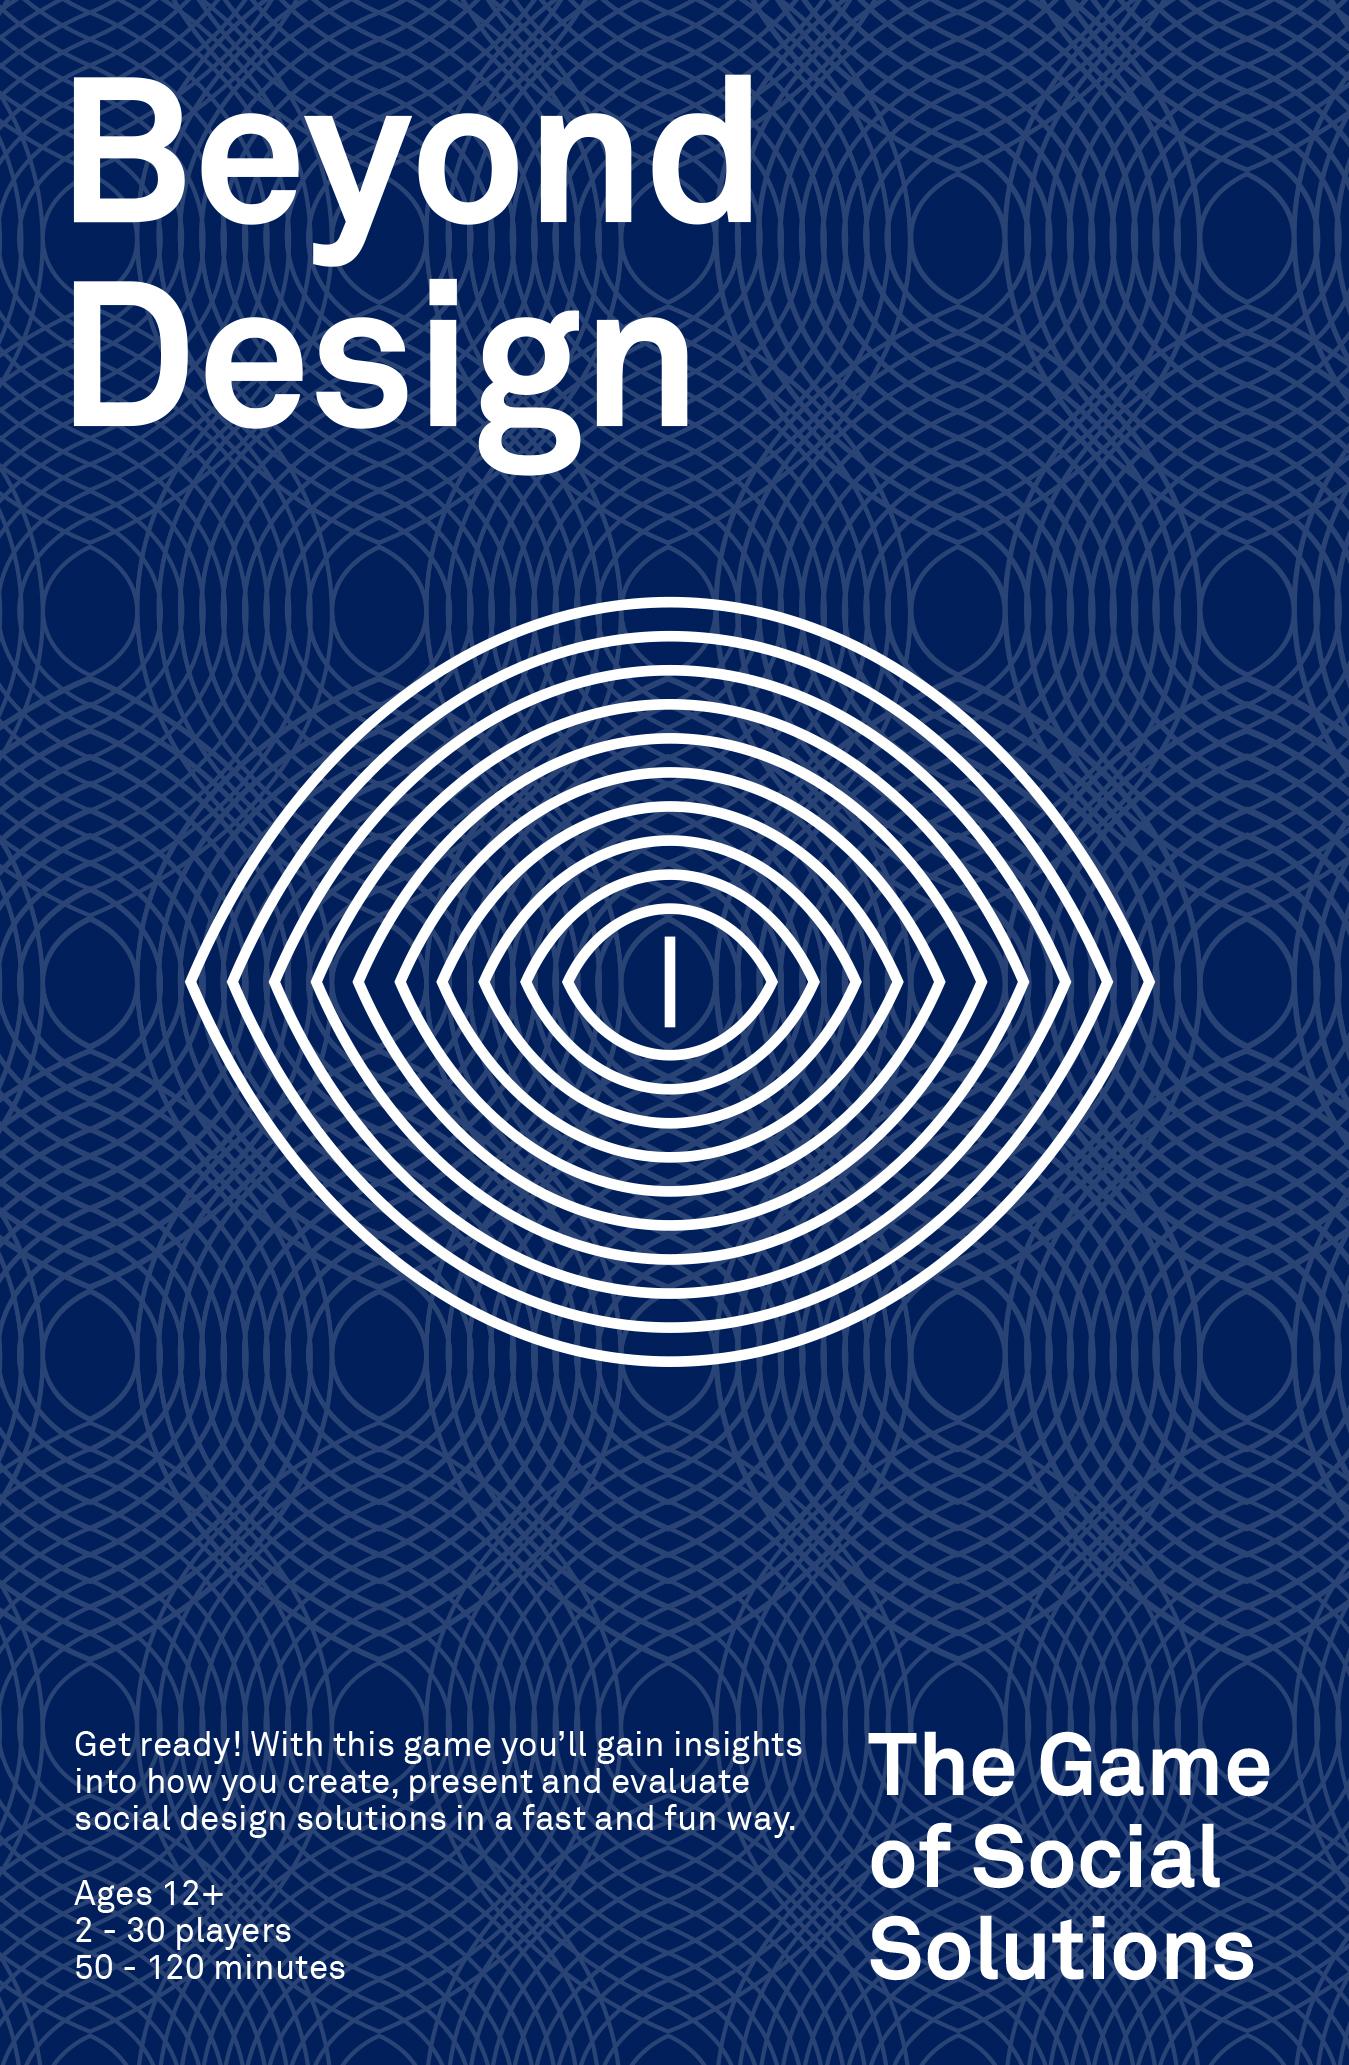 Beyond Design - Product Thumbnail